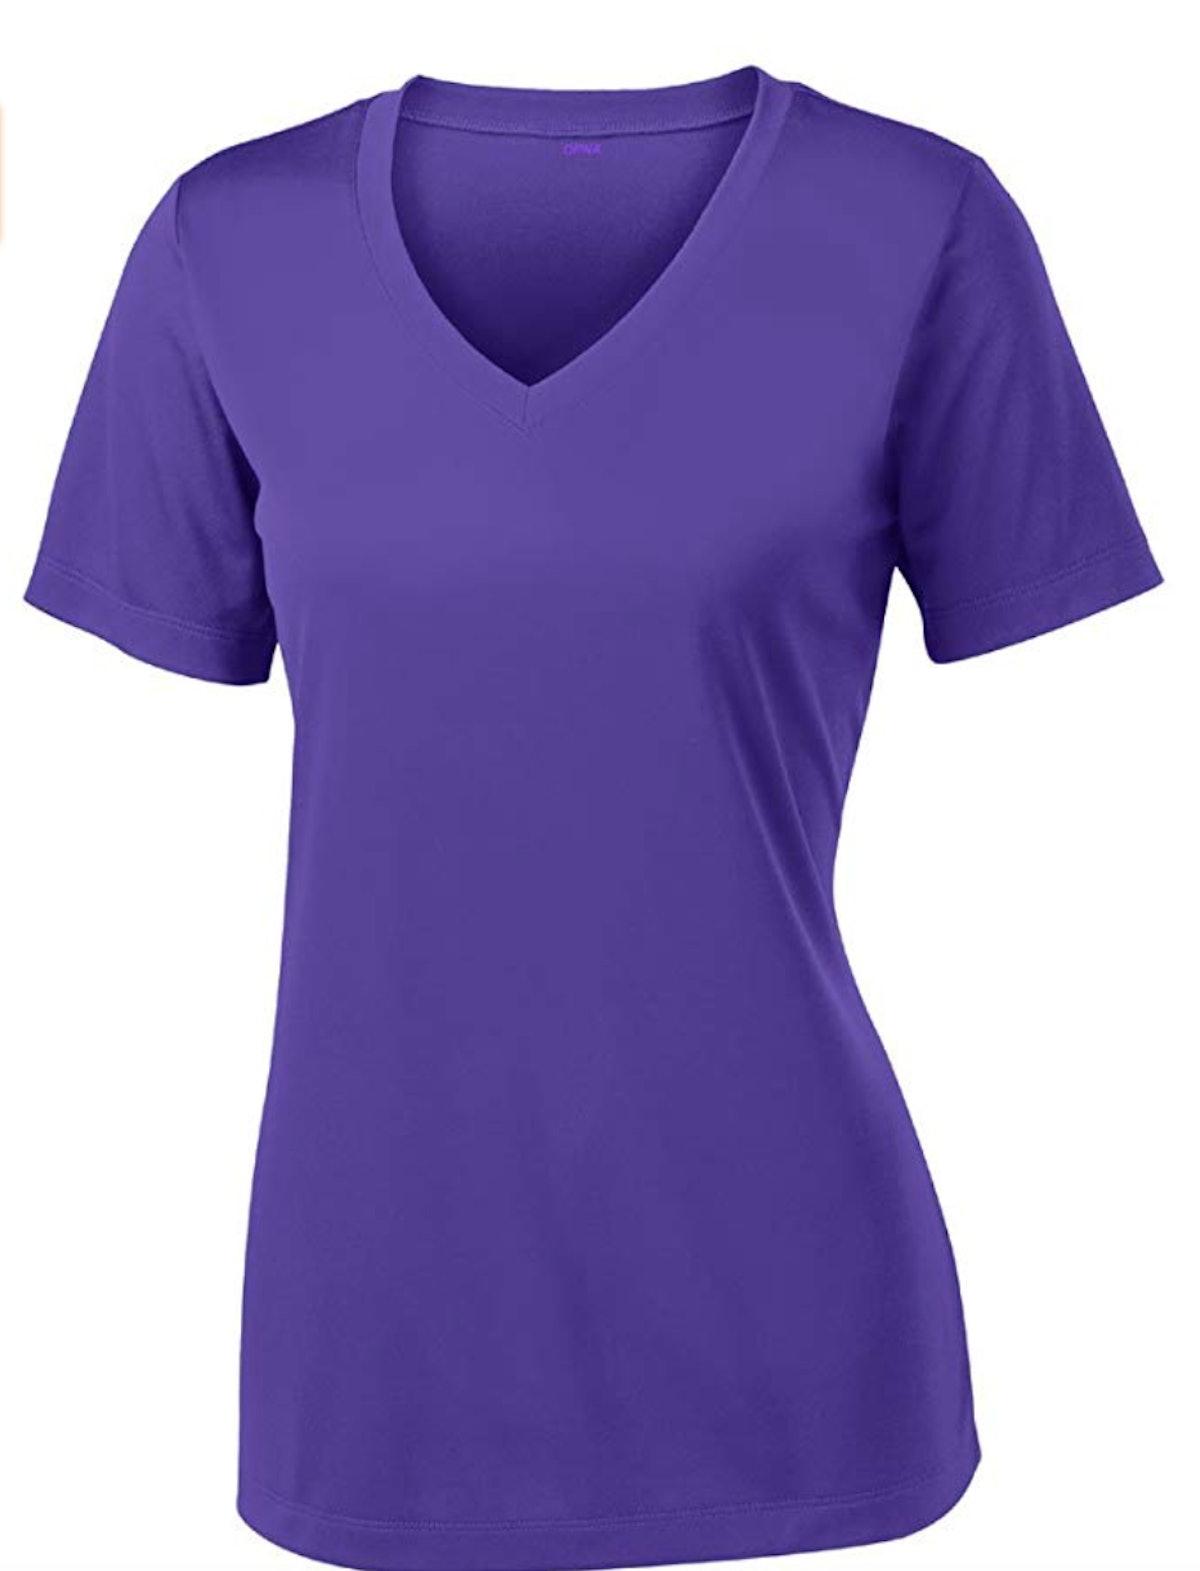 Opna Women's Short Sleeve Moisture Wicking Athletic Shirts